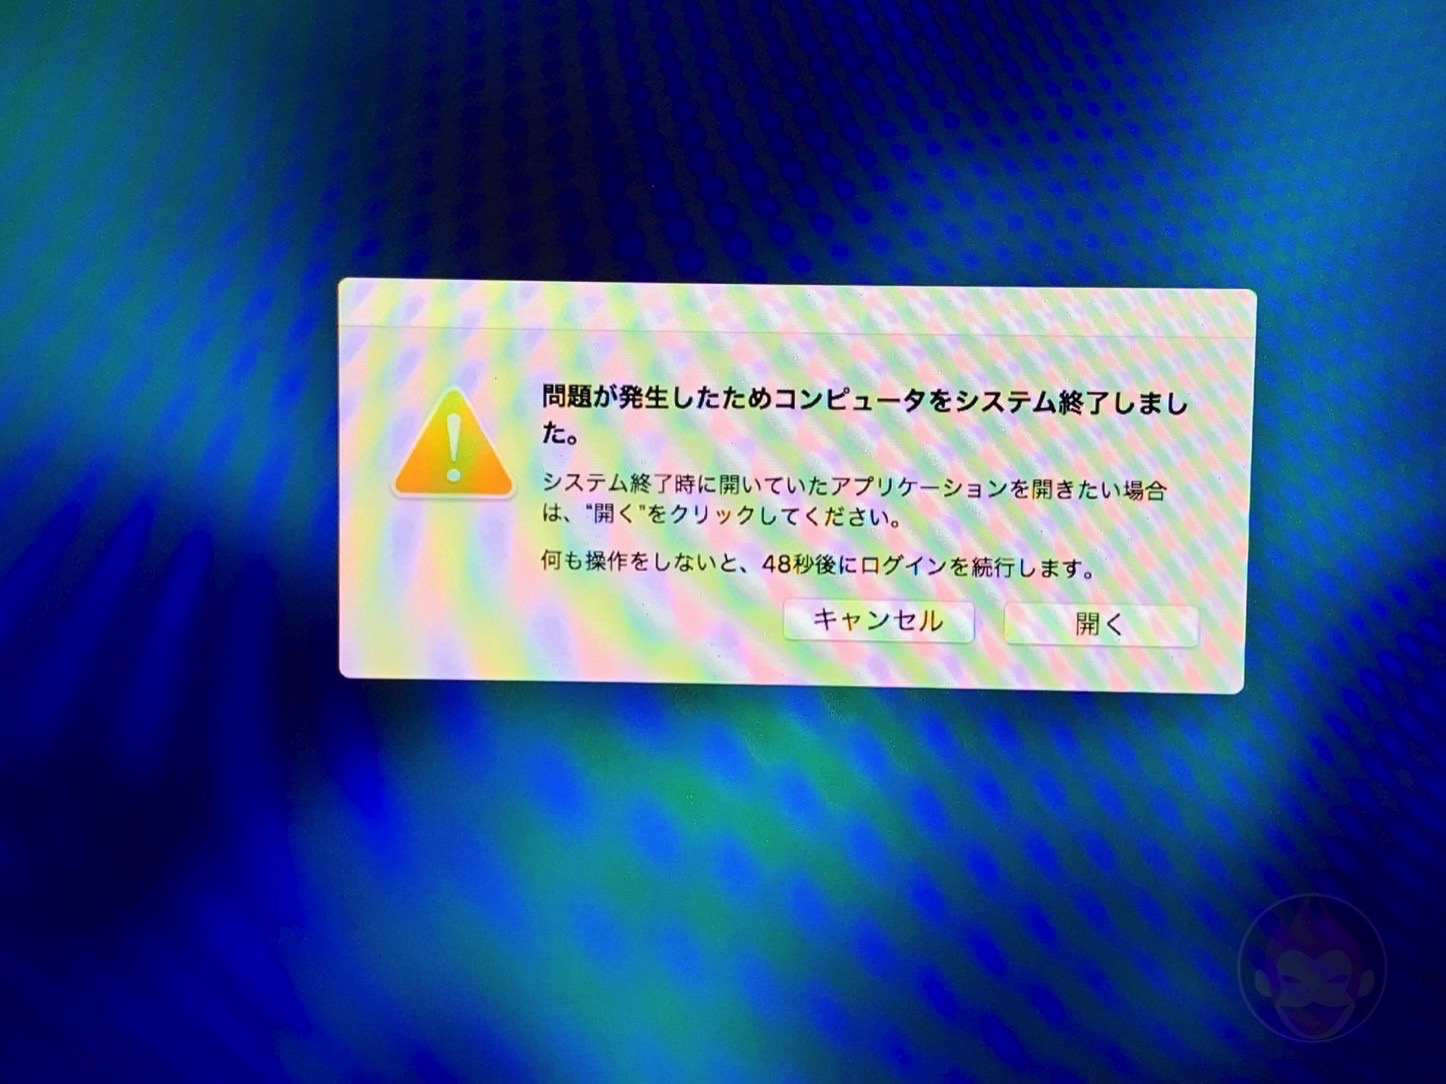 MacBook Pro Late 2016 Error